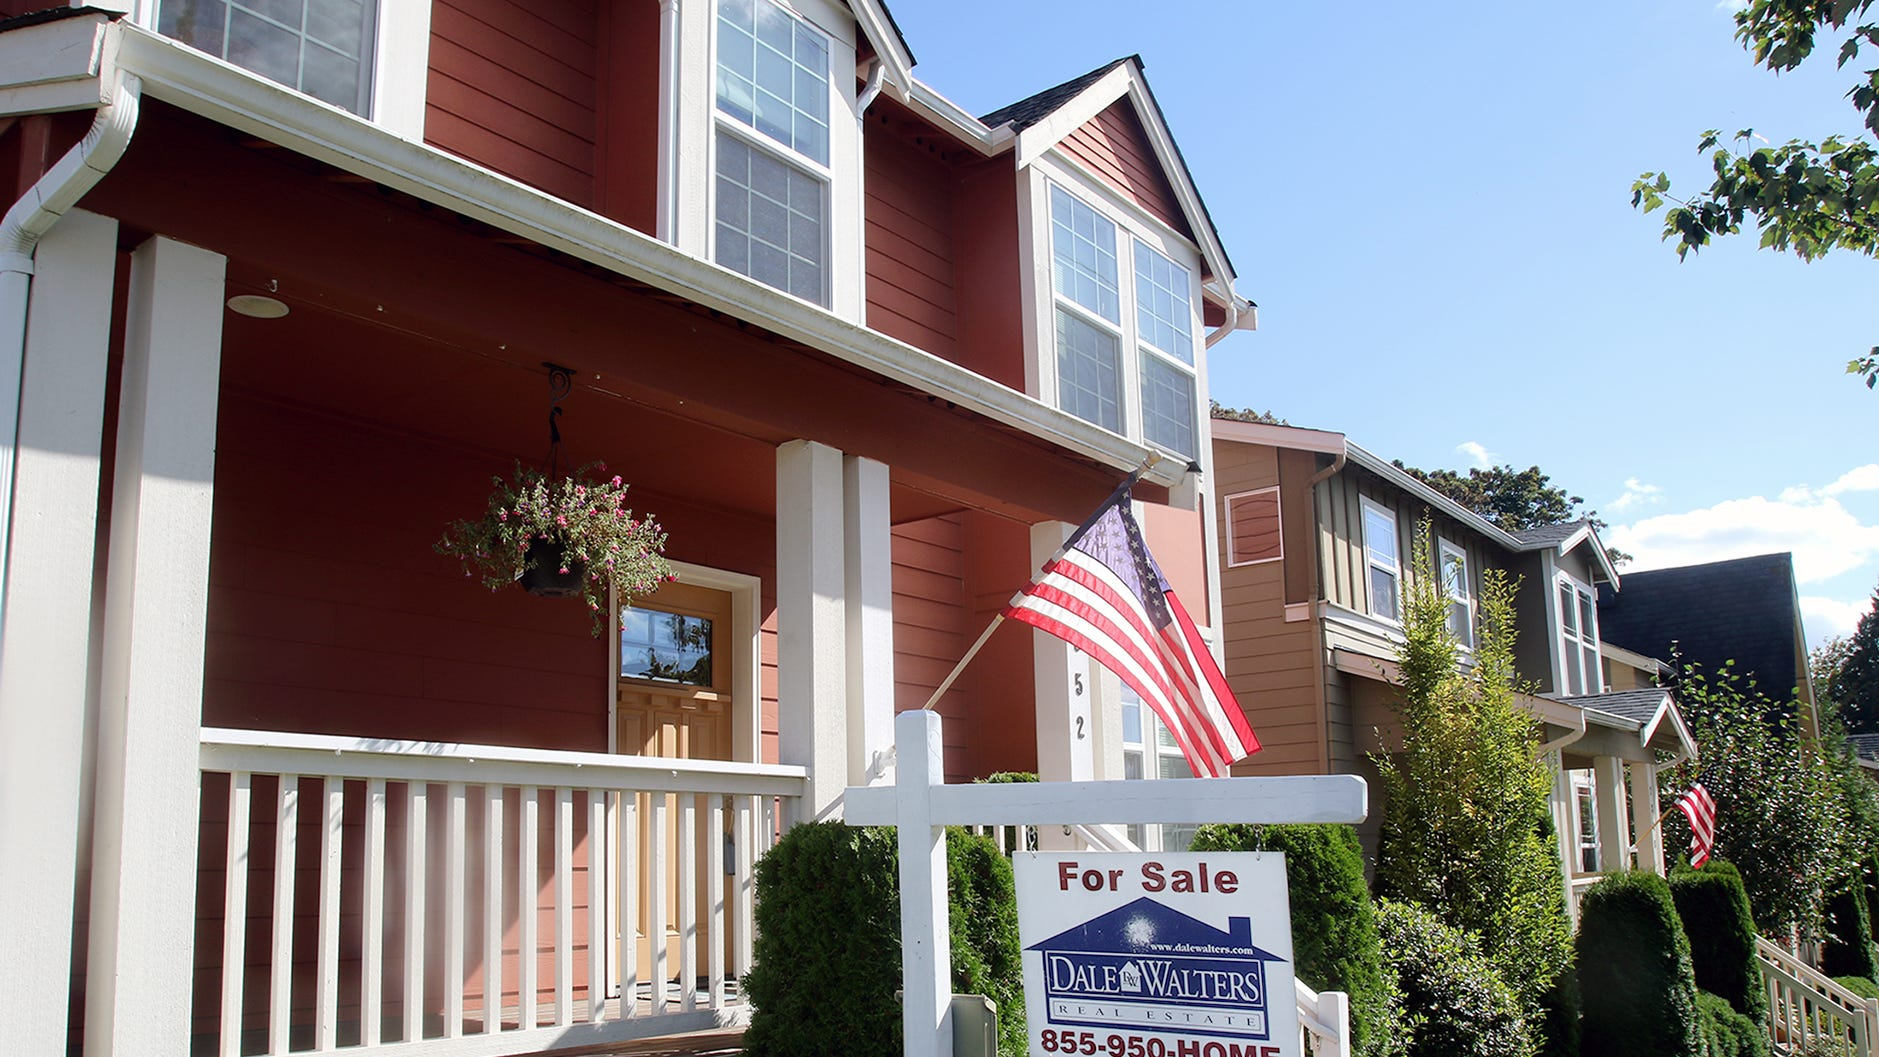 Homebuyers getting a break in cooling market